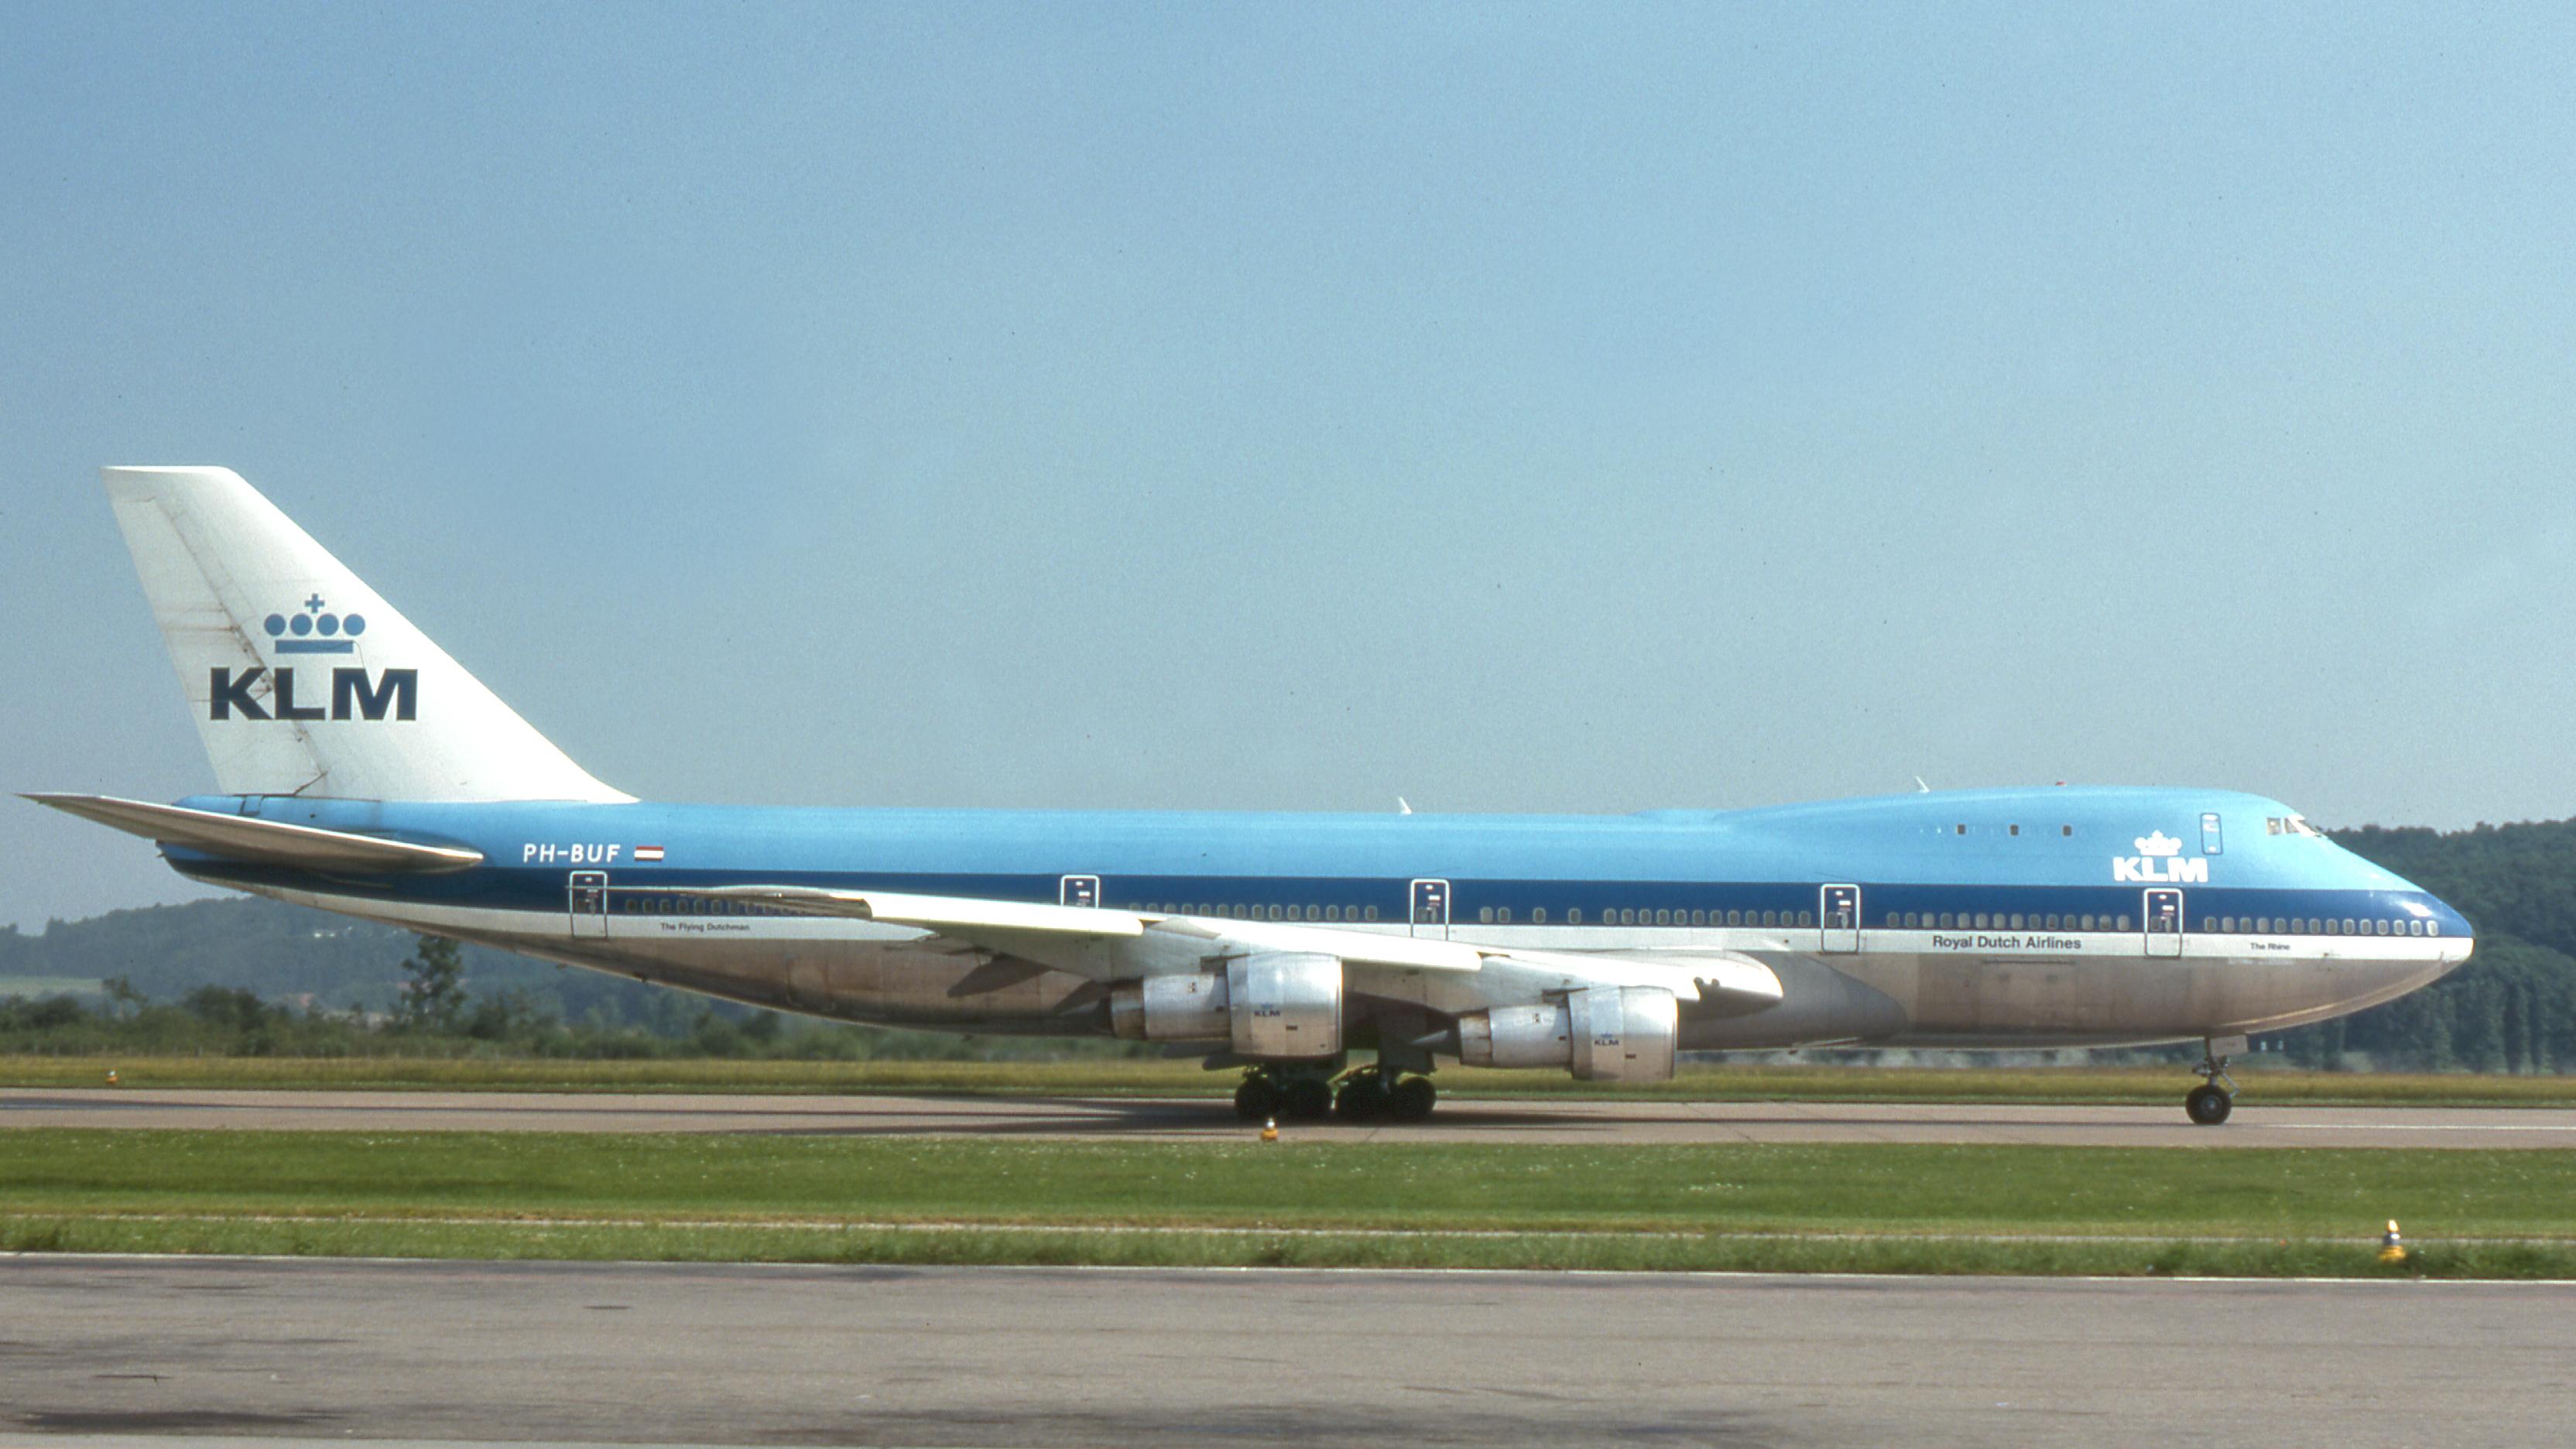 KLM_Boeing_747-200_PH-BUF_(7491686916).j